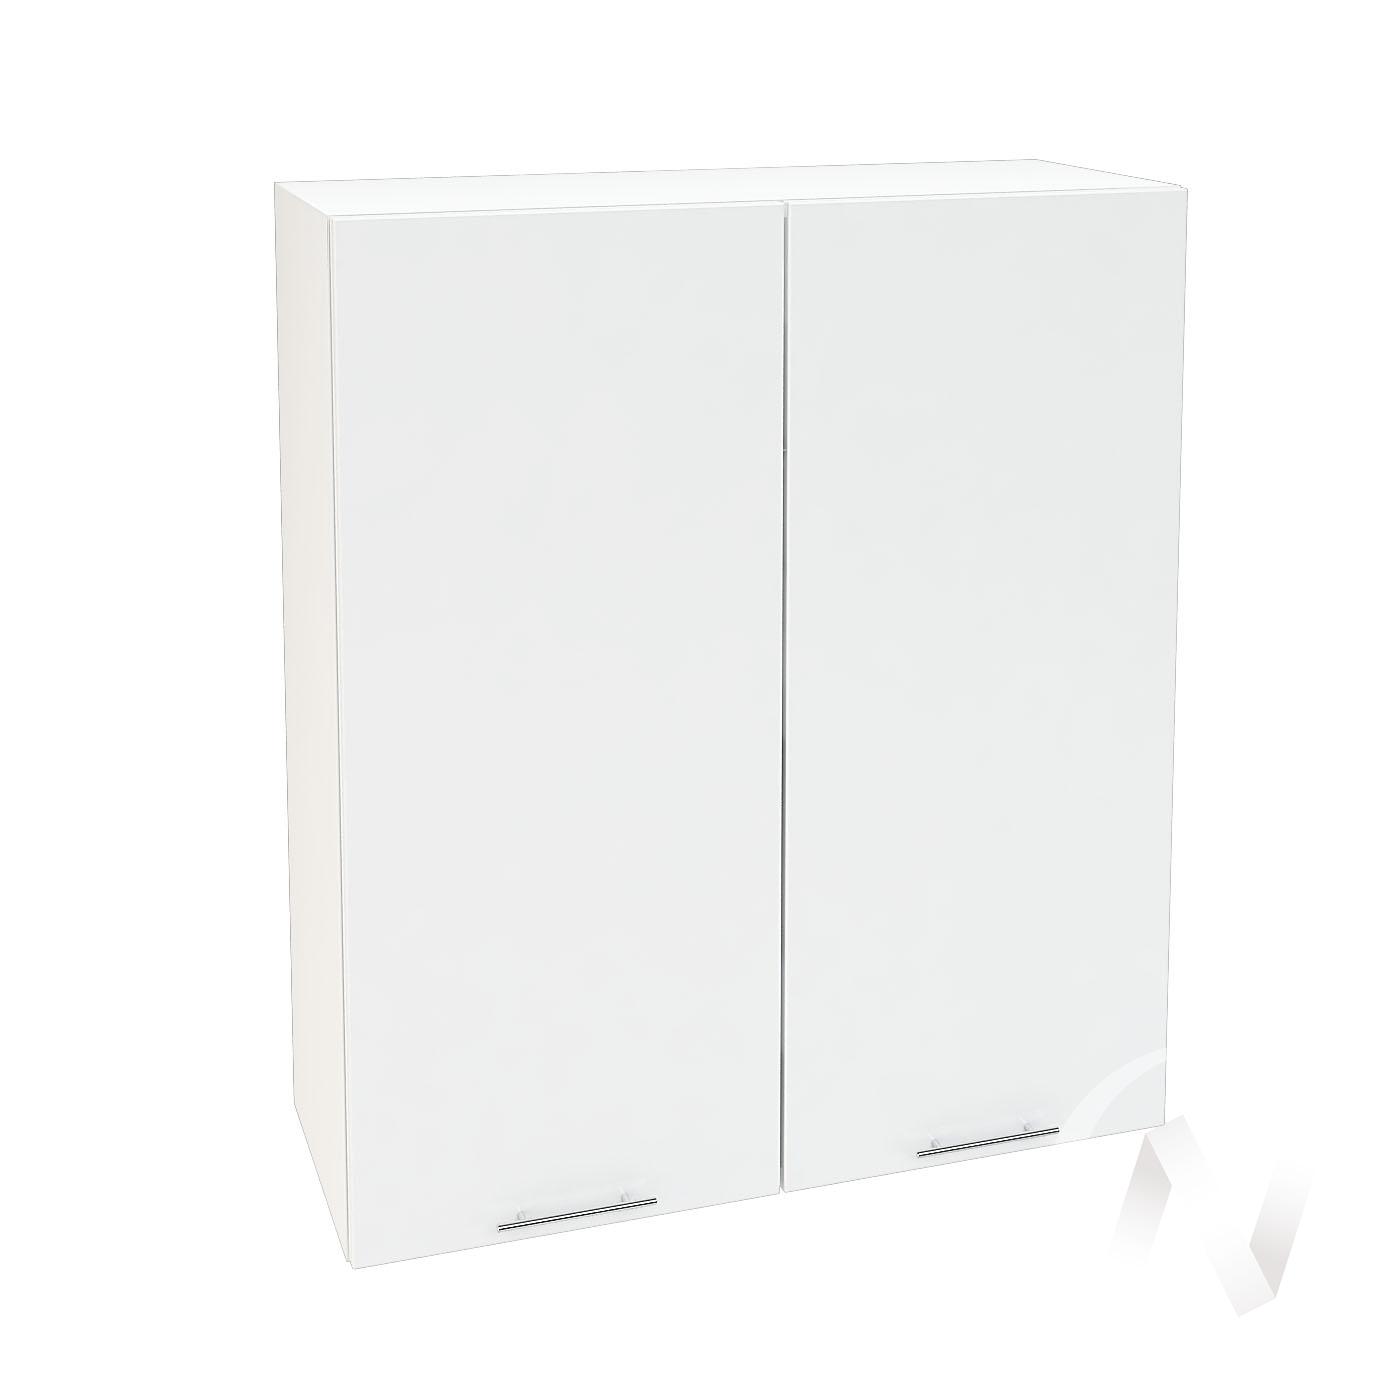 "Кухня ""Валерия-М"": Шкаф верхний 809, ШВ 809 (белый глянец/корпус белый)"